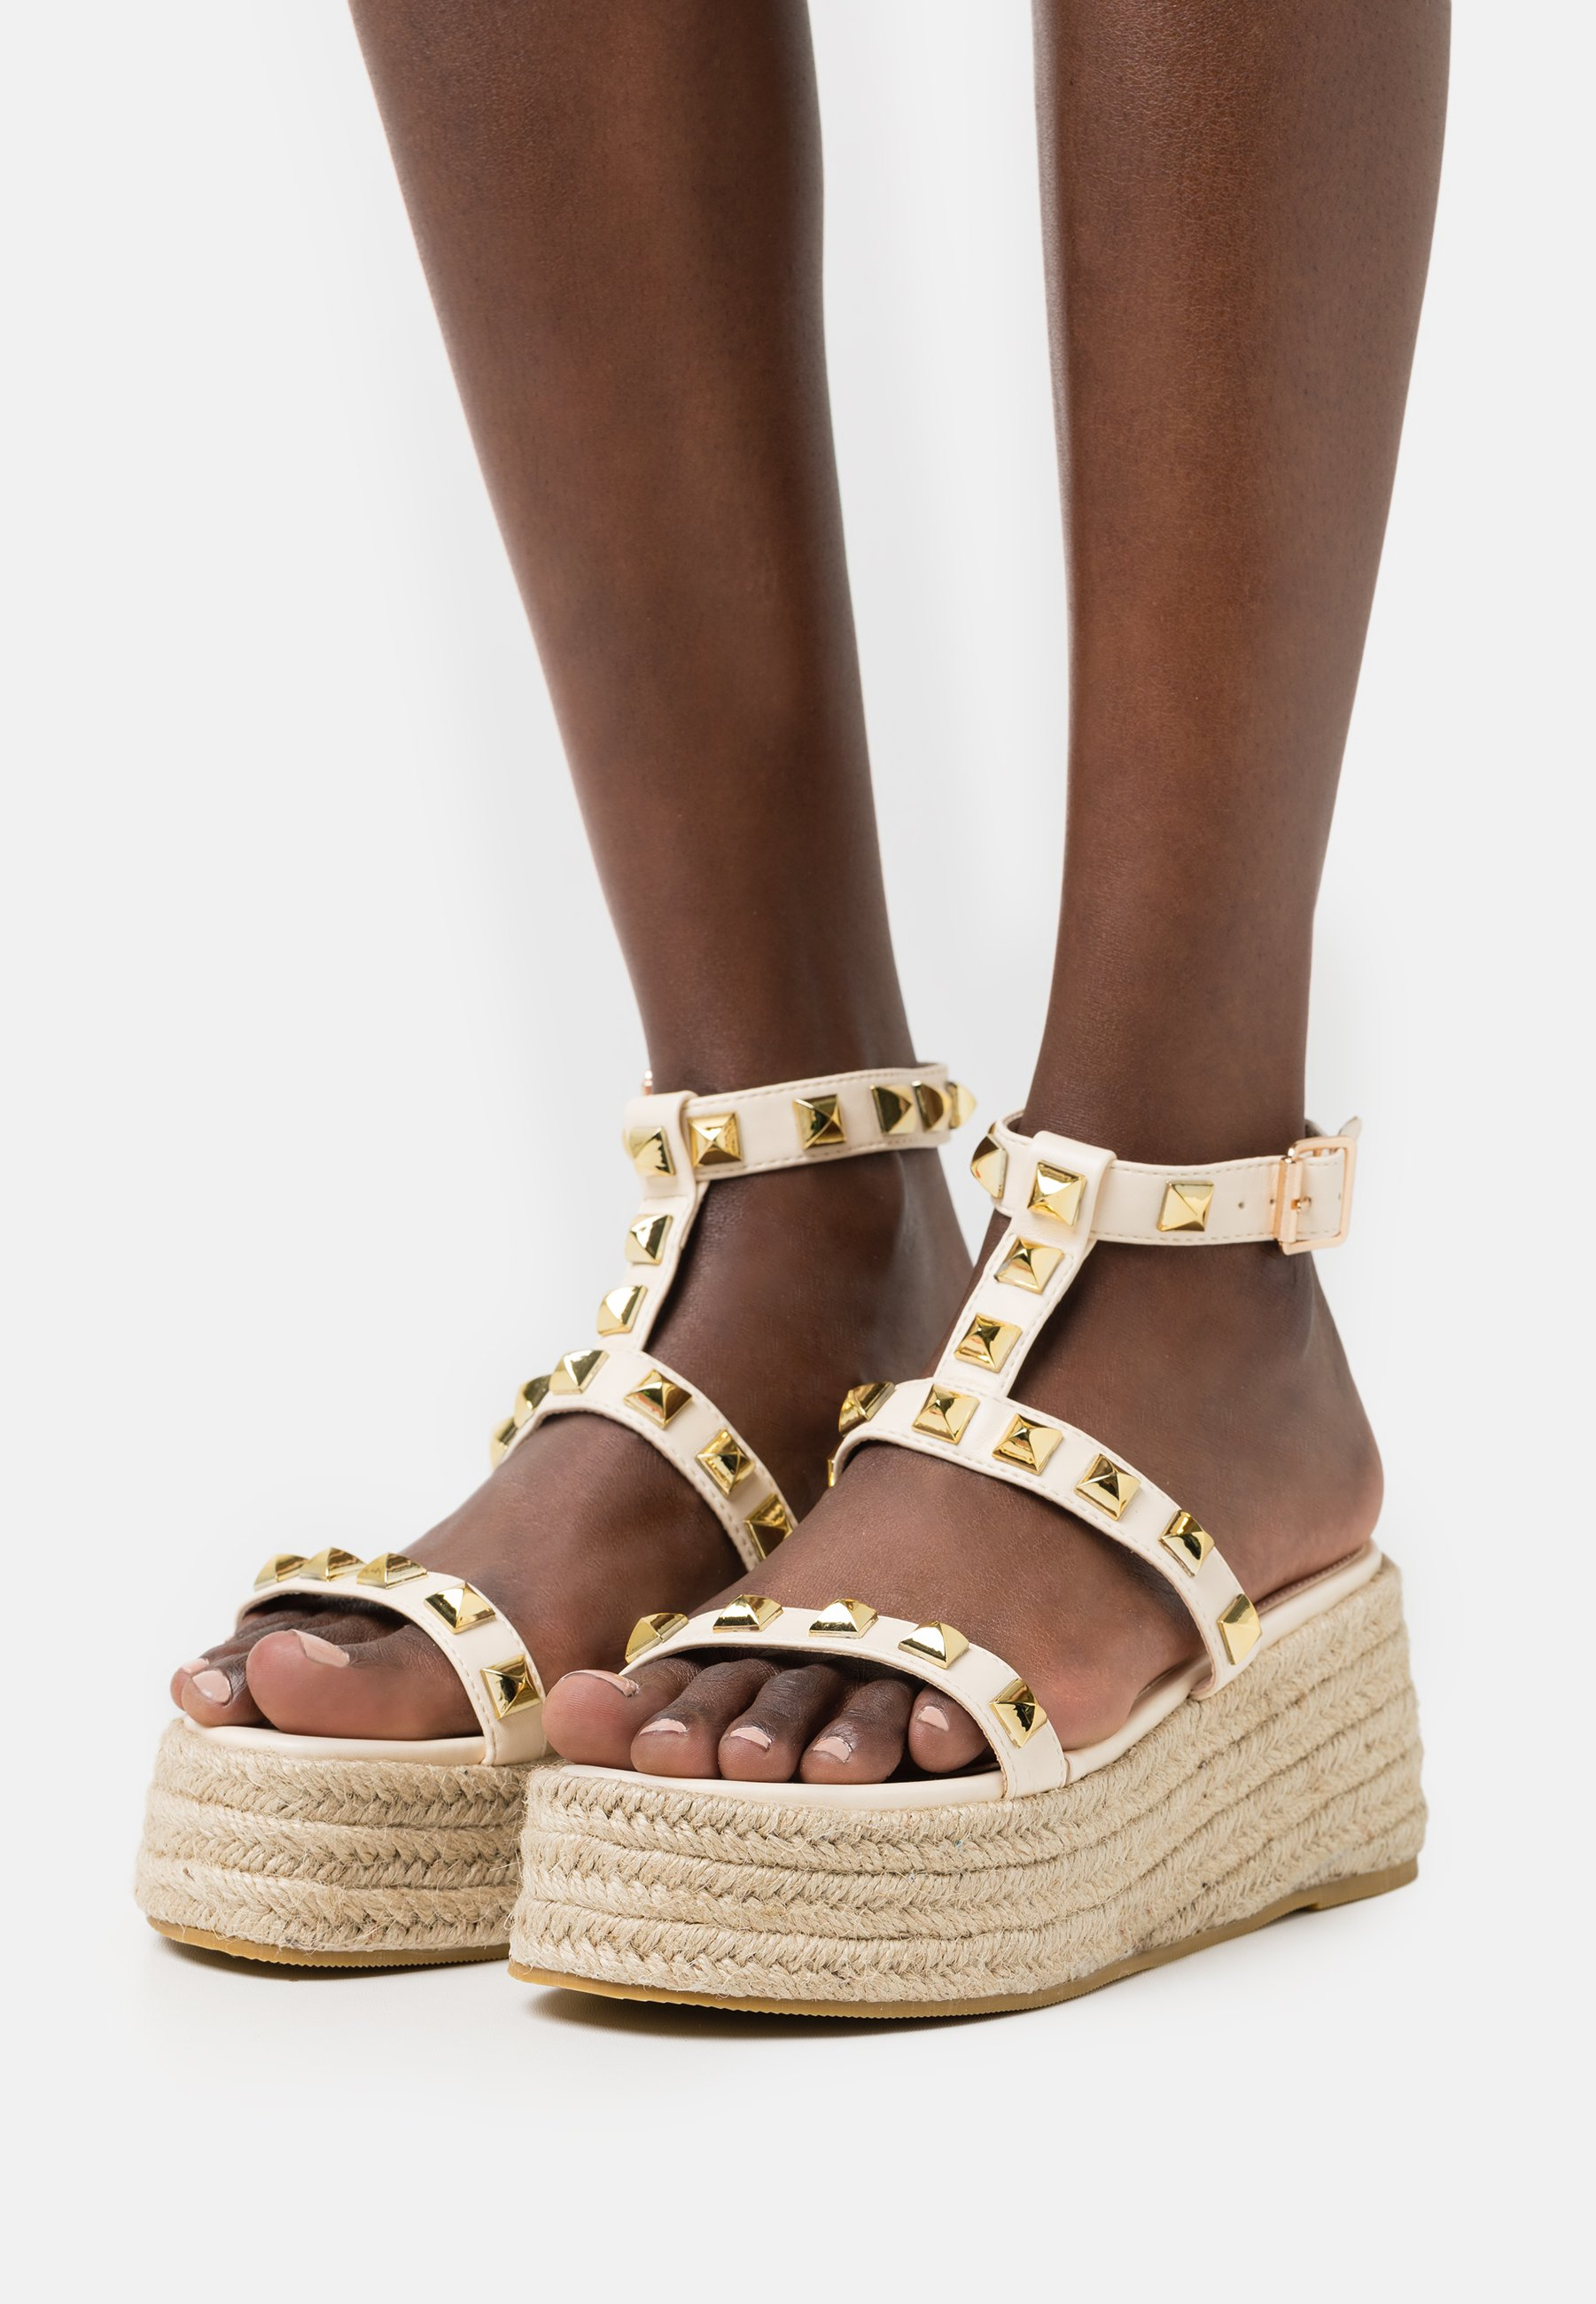 Women MOXIE - Platform sandals - nude